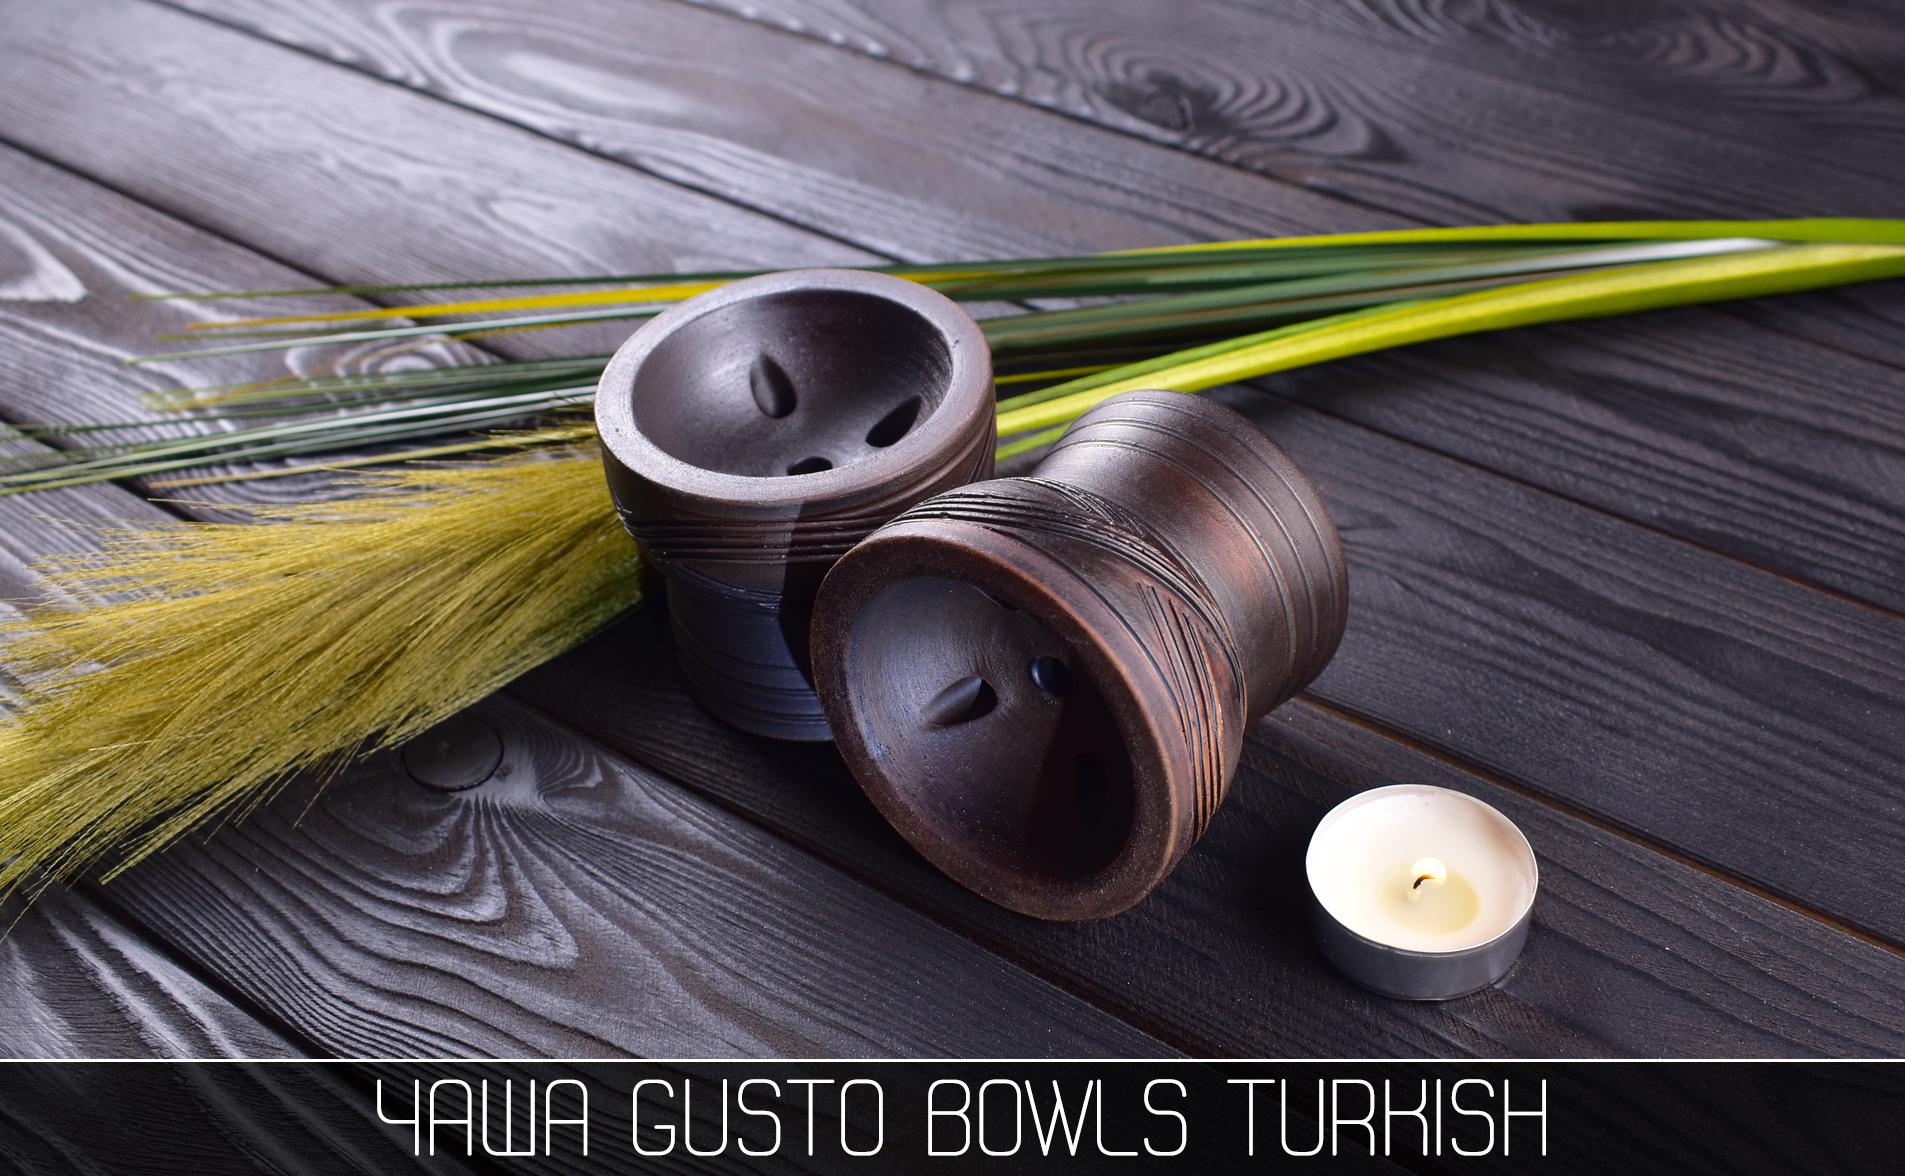 Чаша для кальяна Gusto Bowls Turkish - фото 2 - Kalyanchik.ua